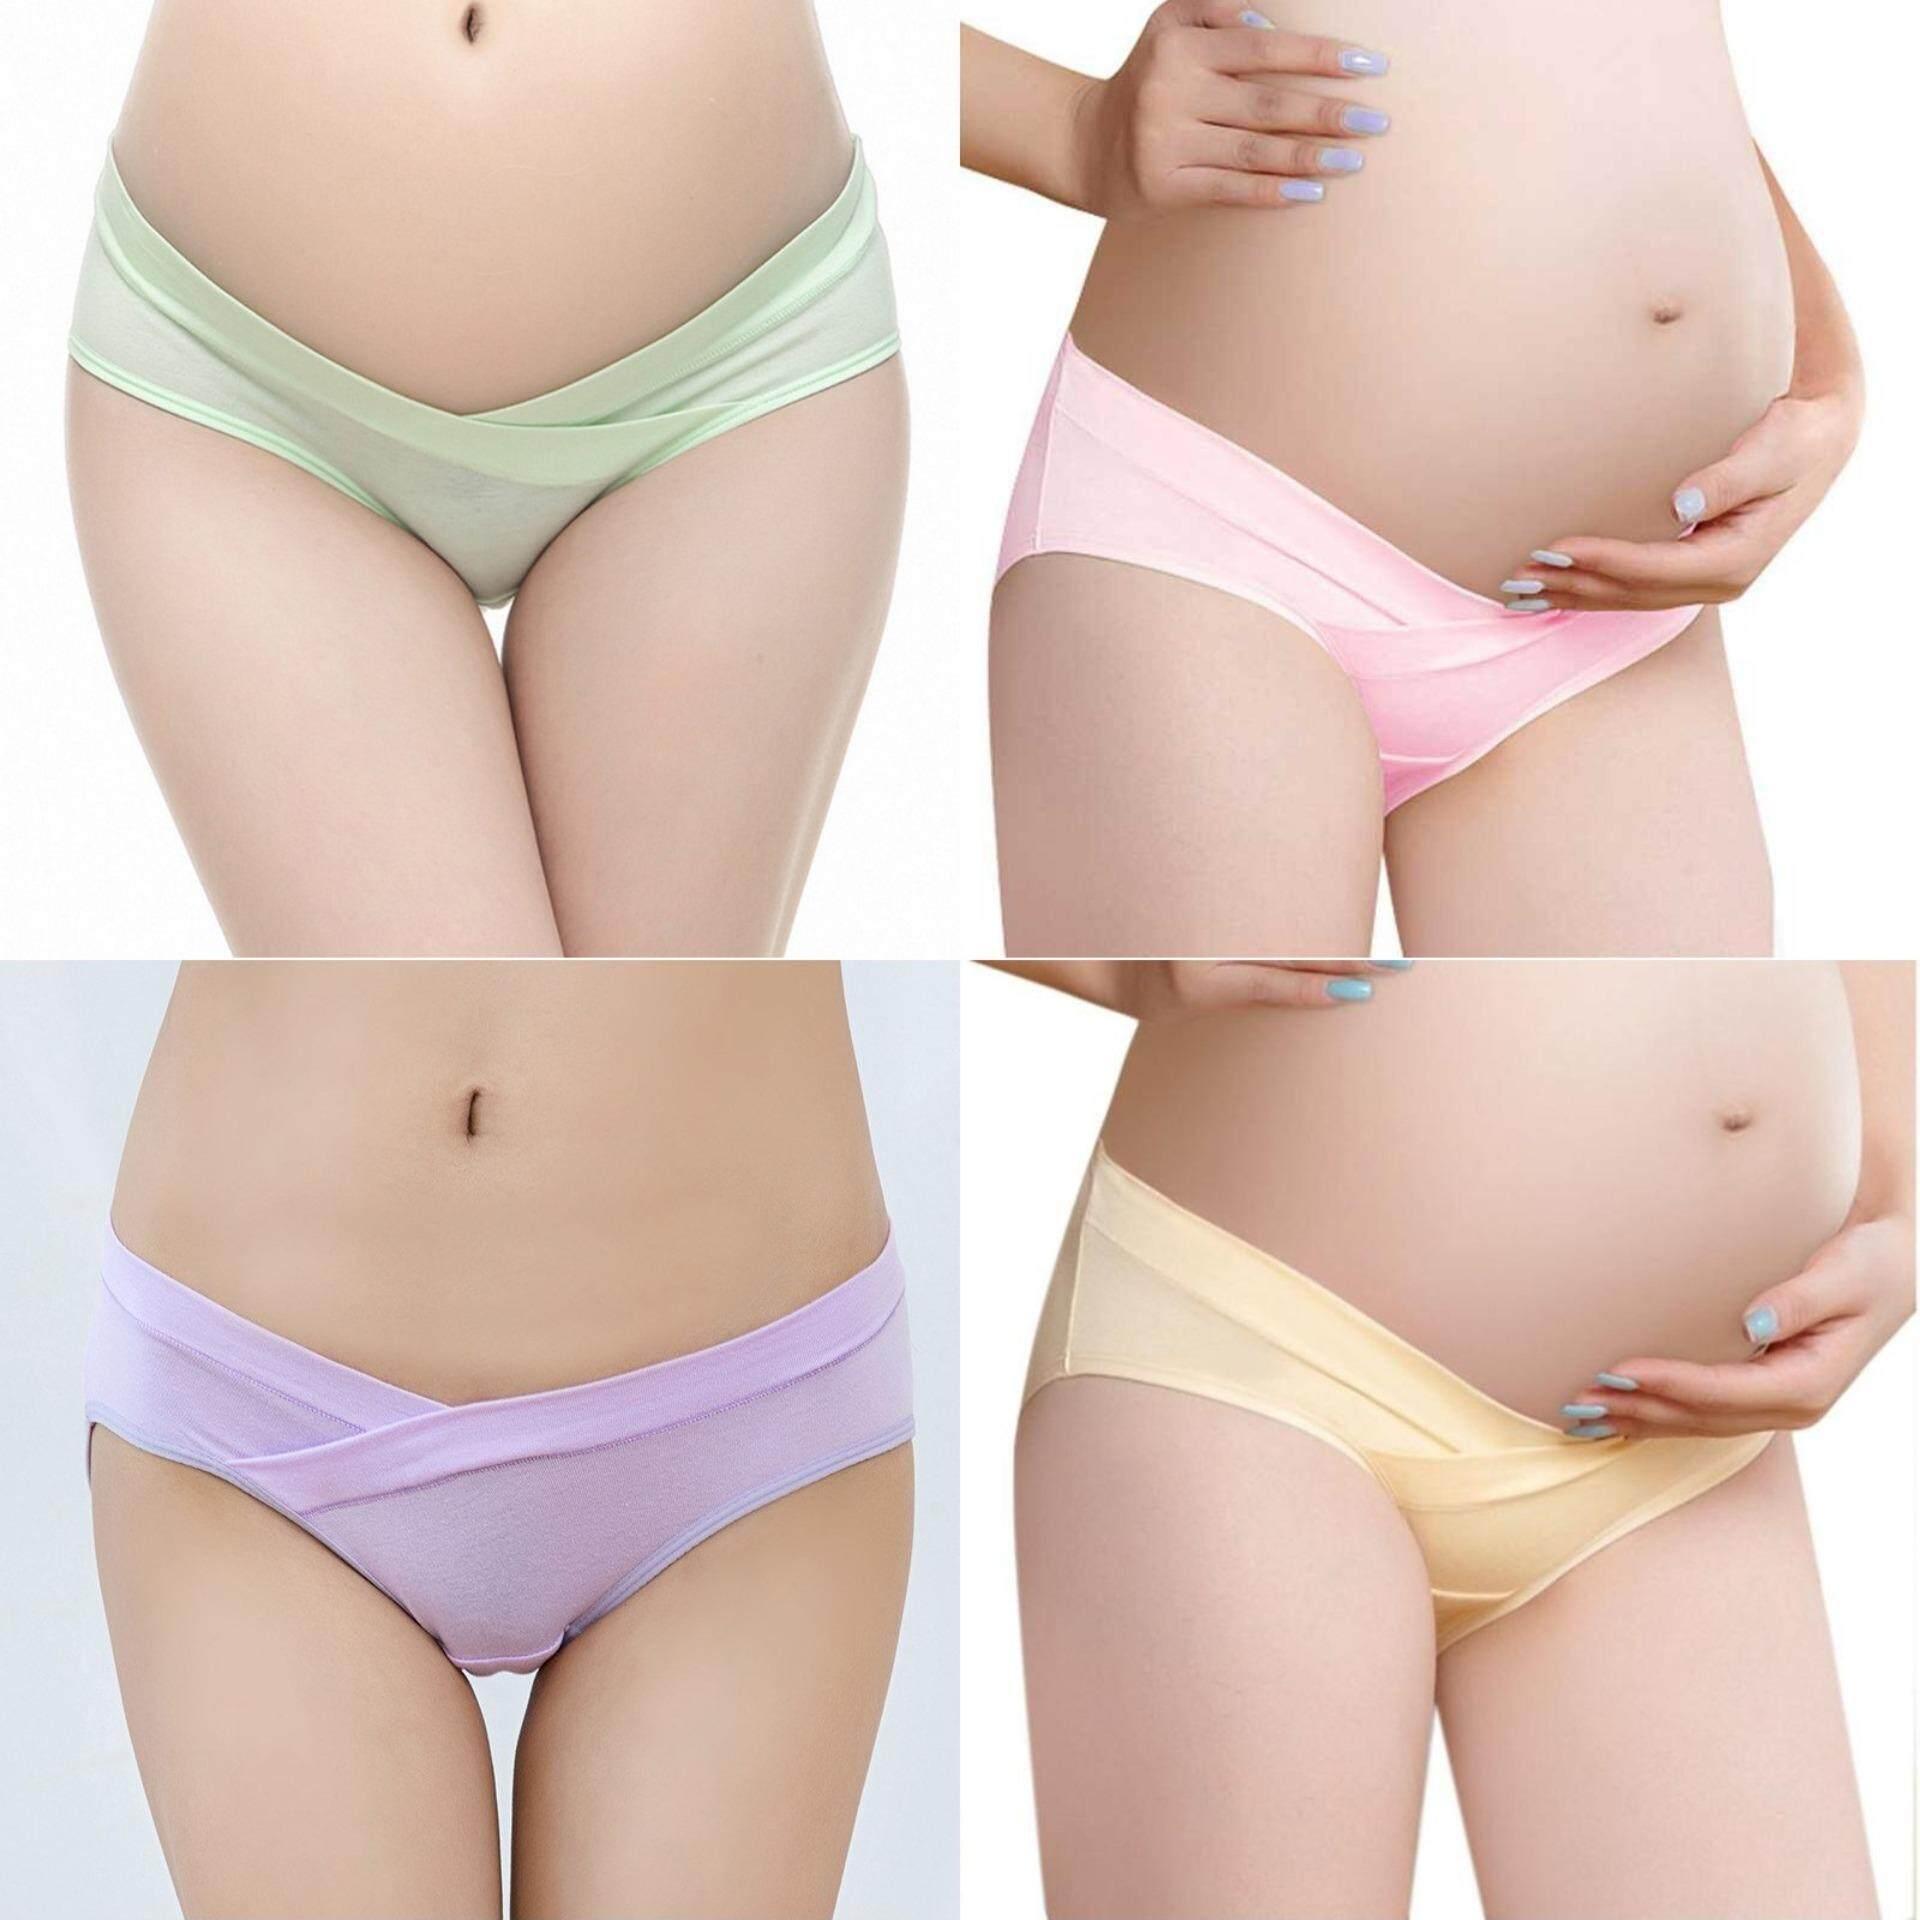 Bolster Store 3 Pieces Ladies Women Pregnant Maternity V Low Waist Cotton Panties Underwear